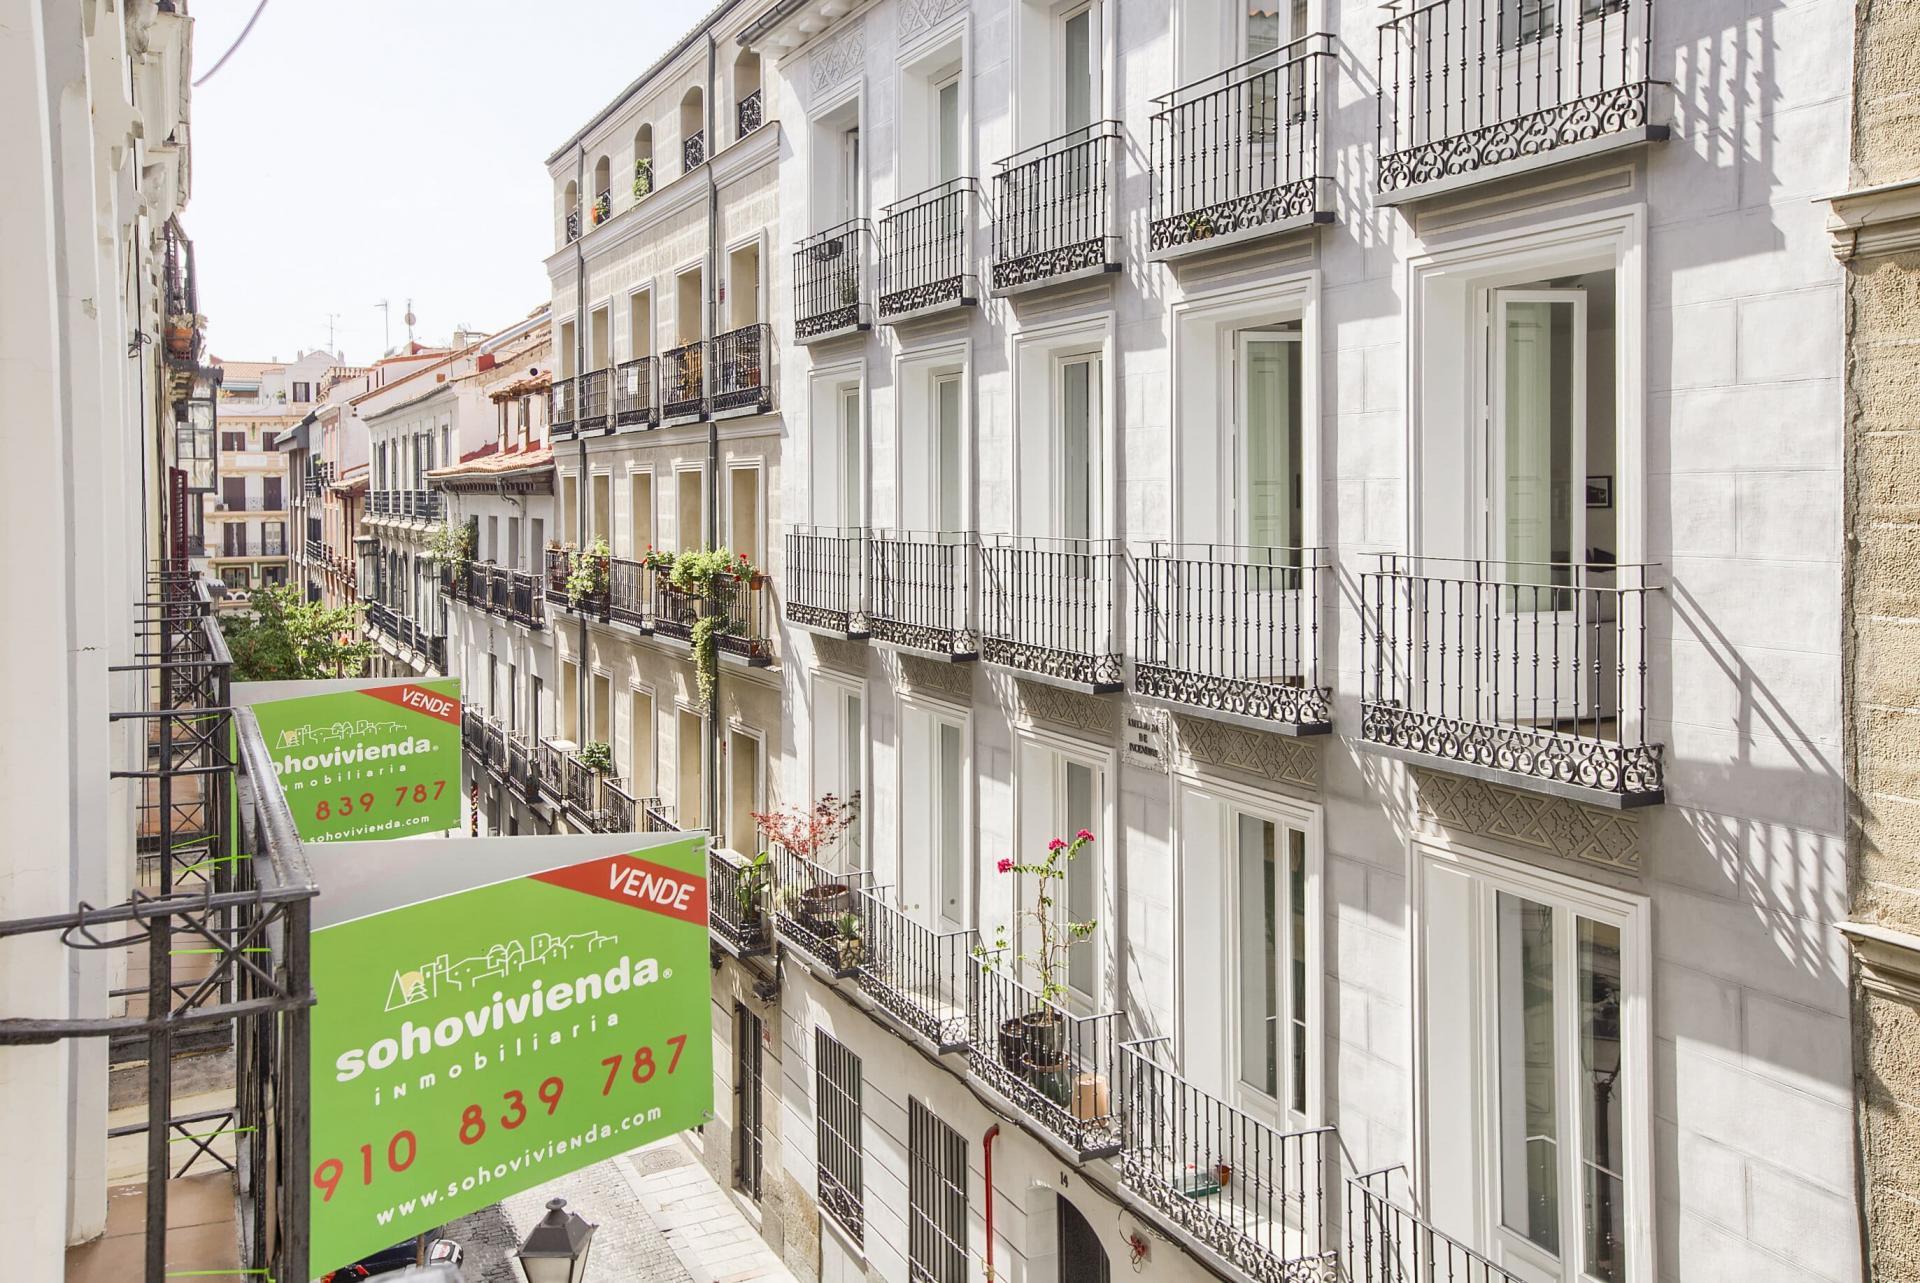 Sohovivienda: comprar o vender piso en Lavapiés, Madrid